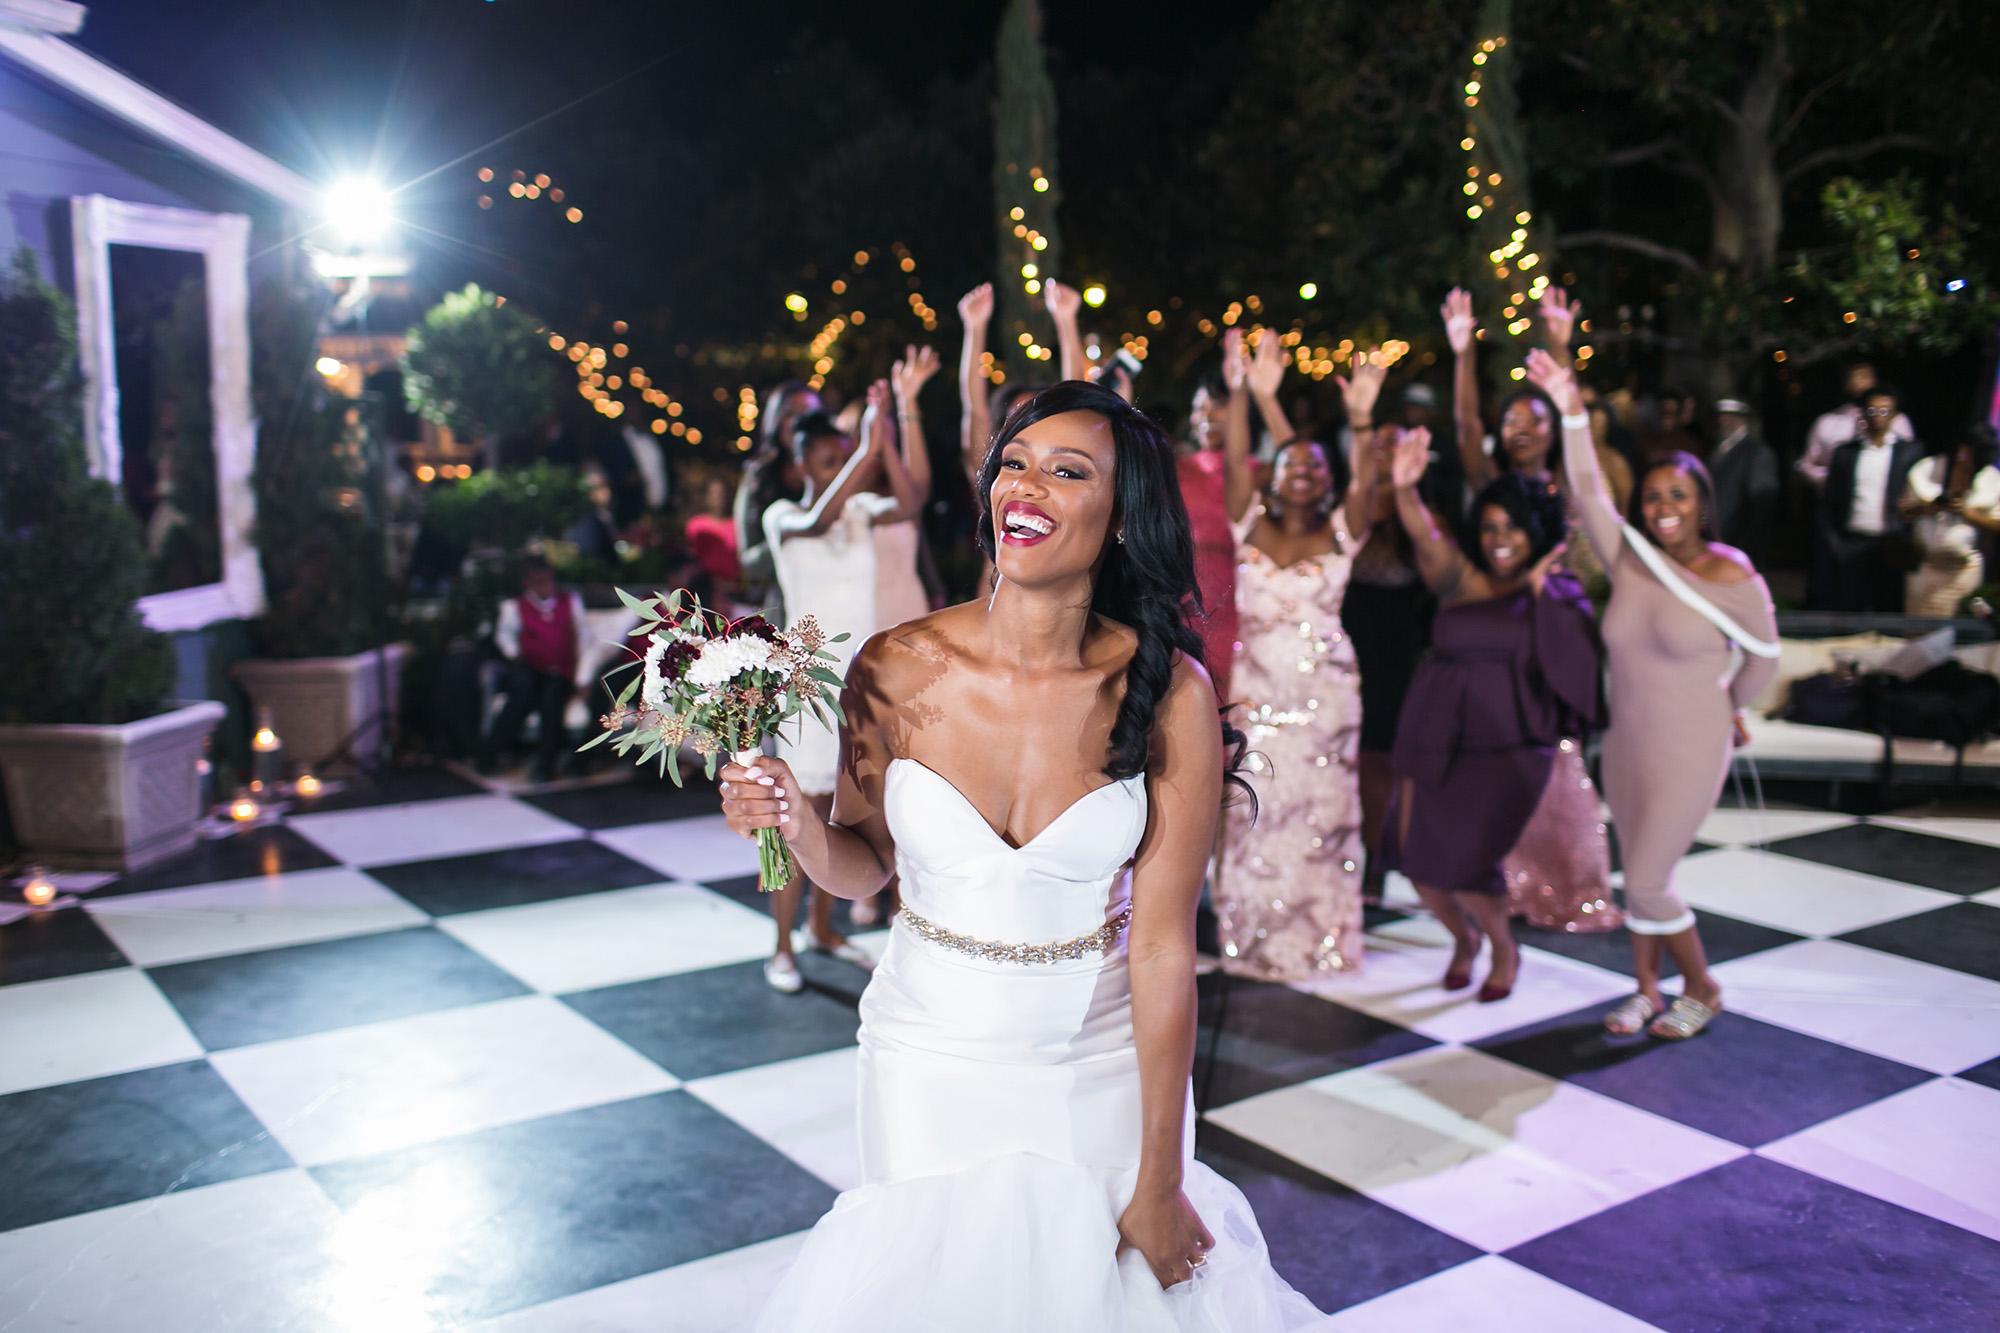 associate-photographer-christmas-house-wedding-carrie-vines-0118.jpg